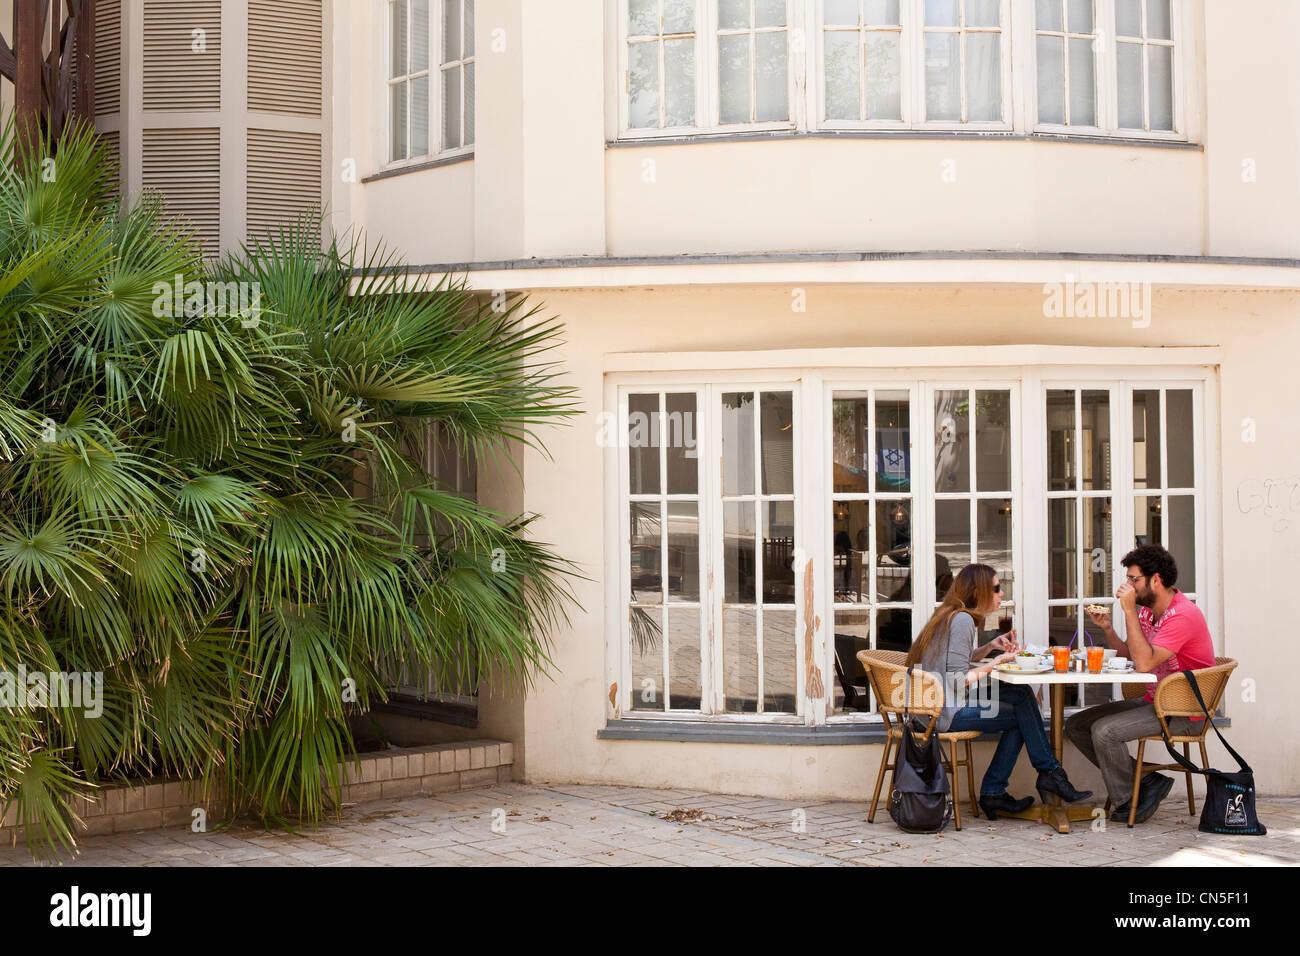 Israel, Tel Aviv, Mazeh Street, Chelouche Gallery, restaurant patio - Stock Image